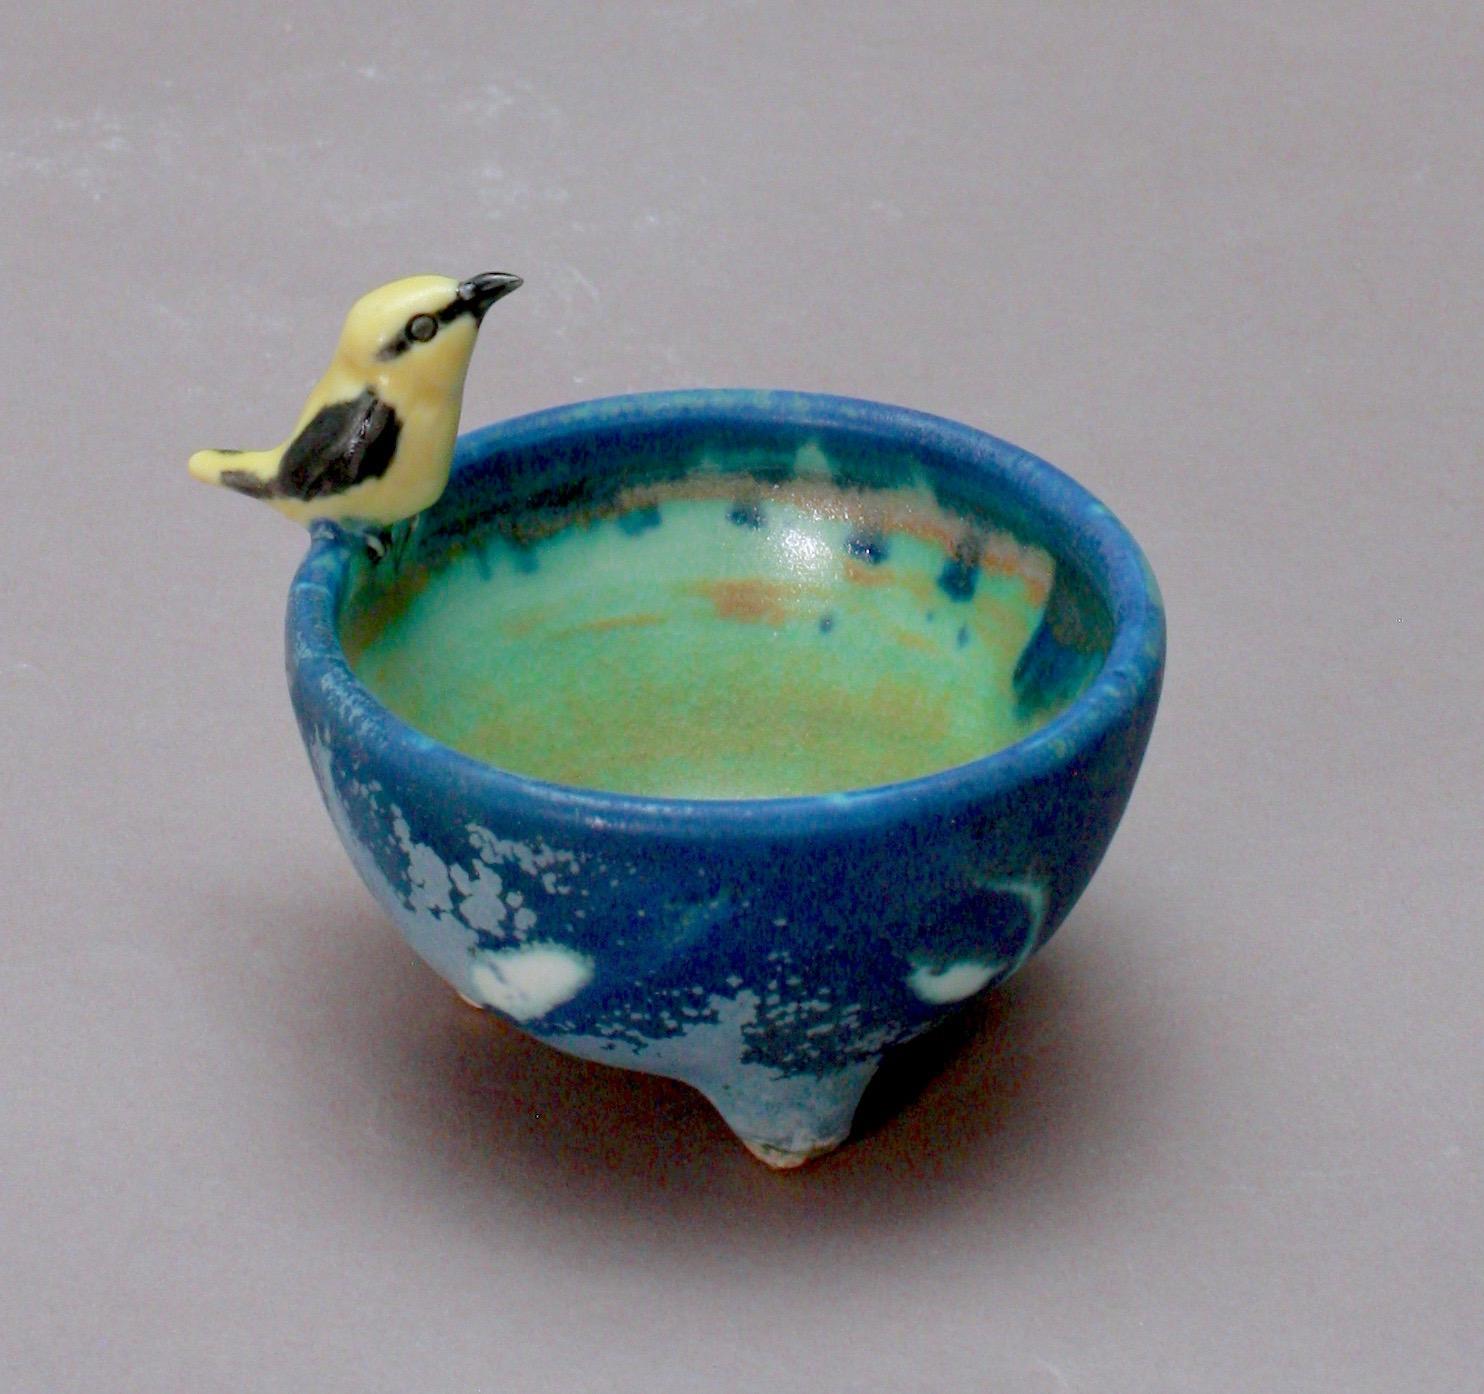 SC-06 | Dark Blue Patterned Salt Cellar with Finch ($95)